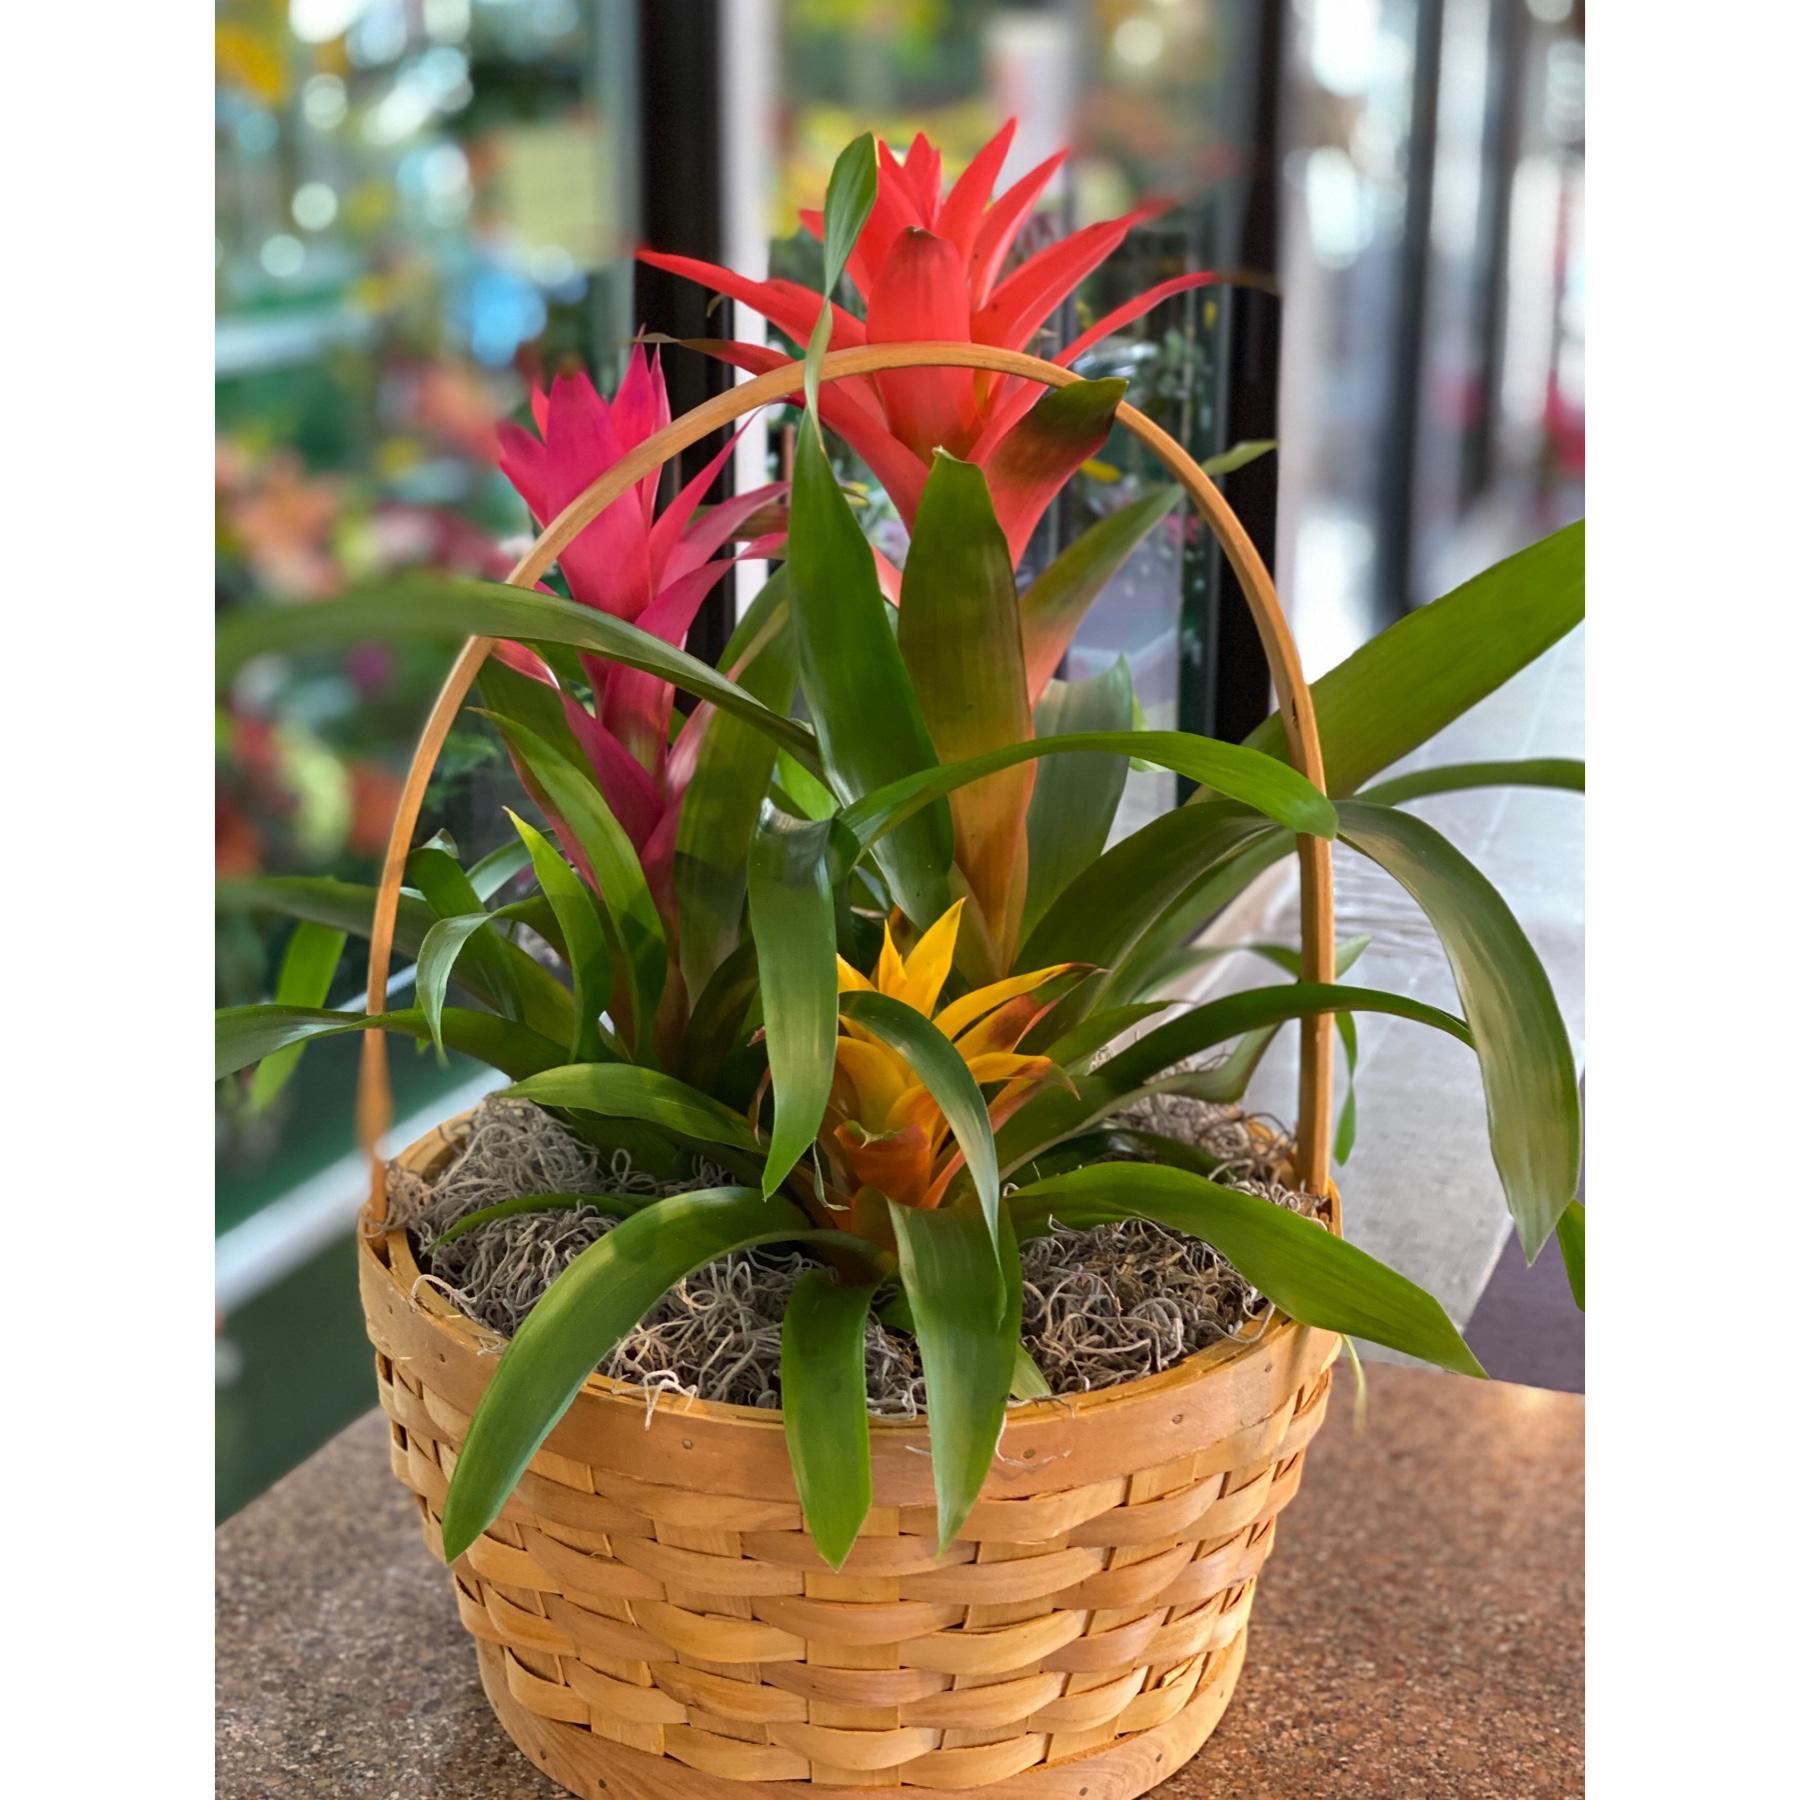 DiBella Flowers & Gifts Las Vegas - Our bromeliad trio basket perfect for a desktop